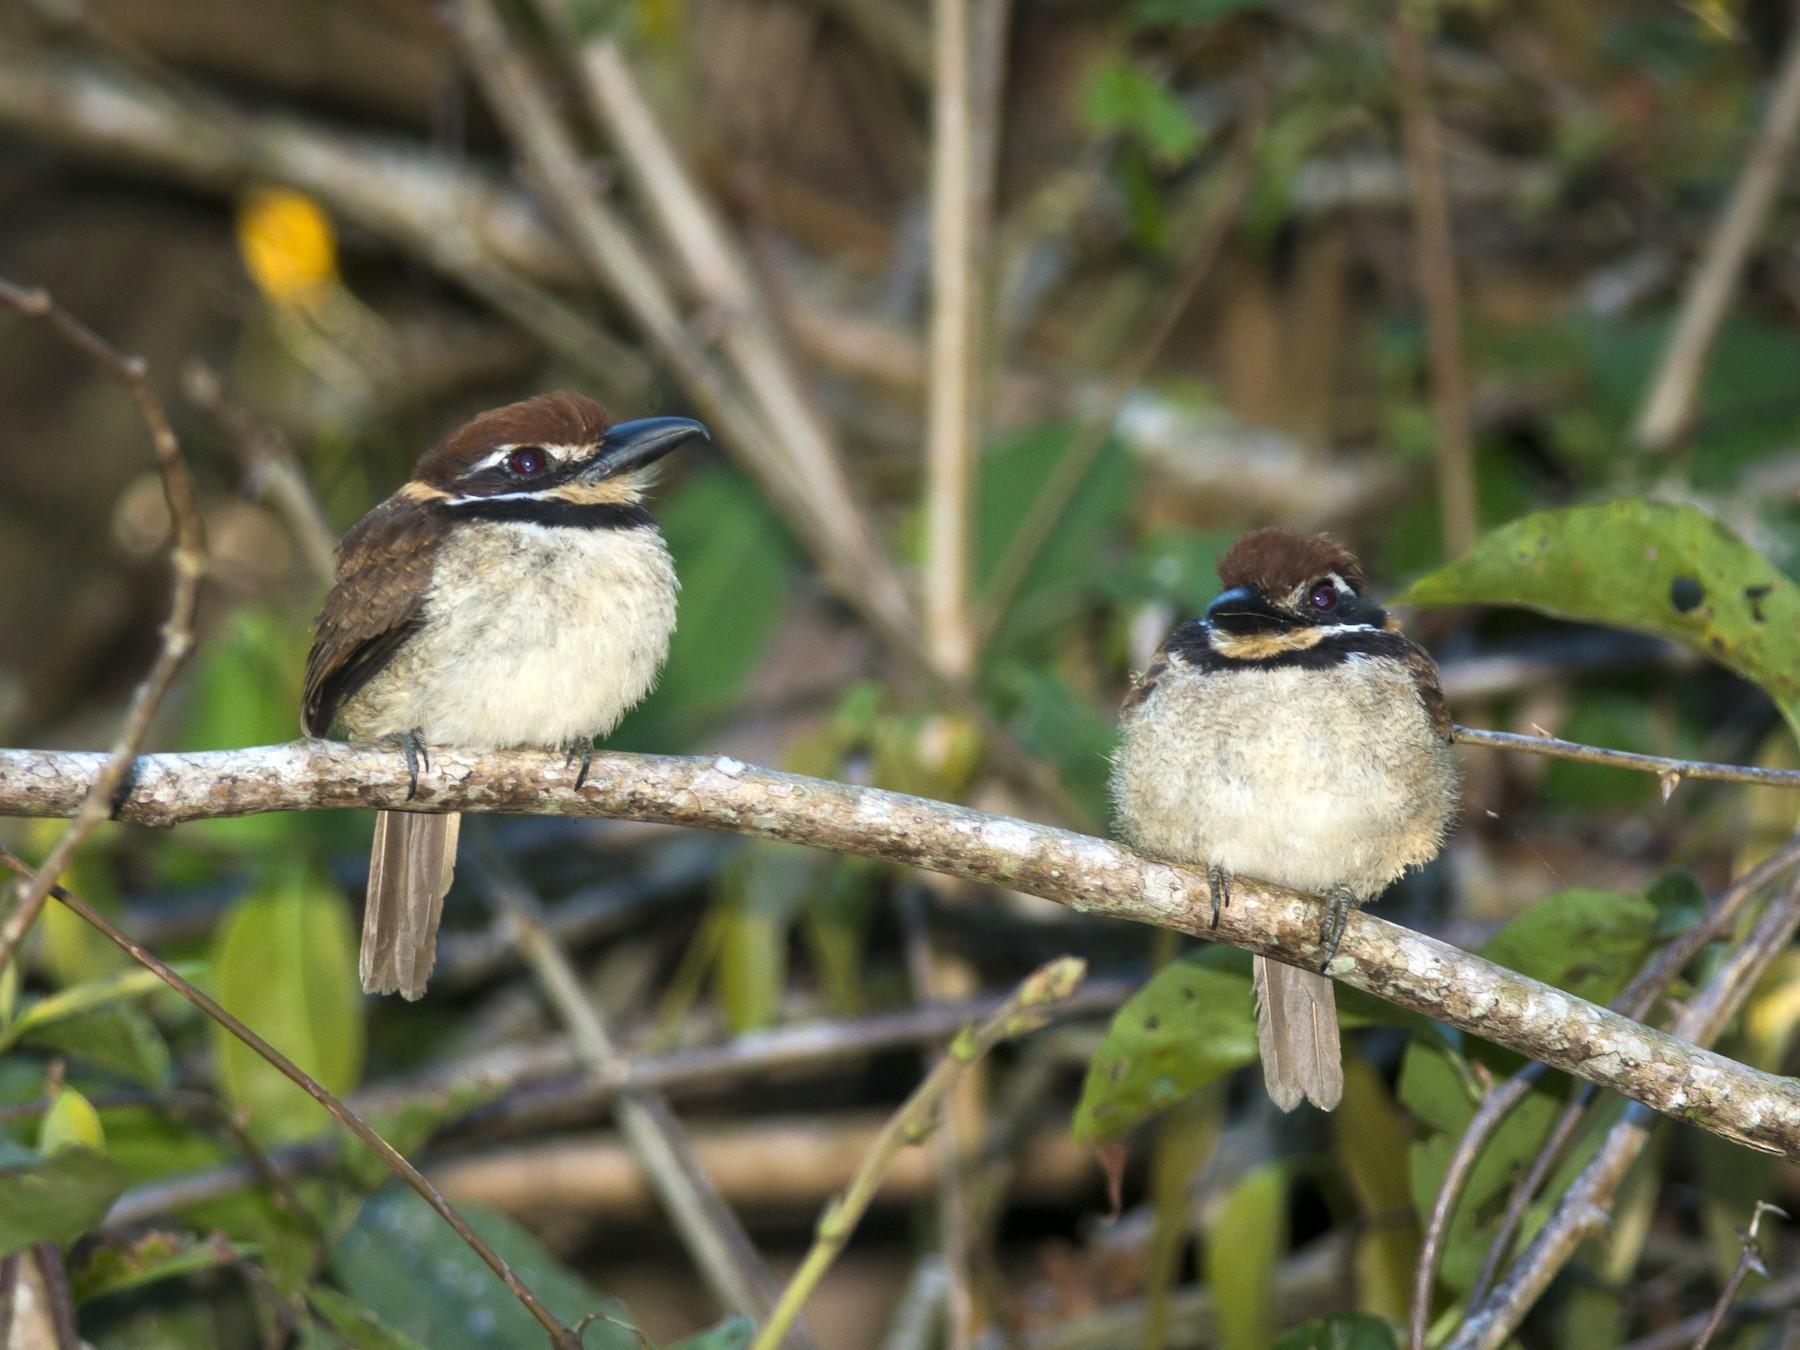 Chestnut-capped Puffbird - Claudia Brasileiro